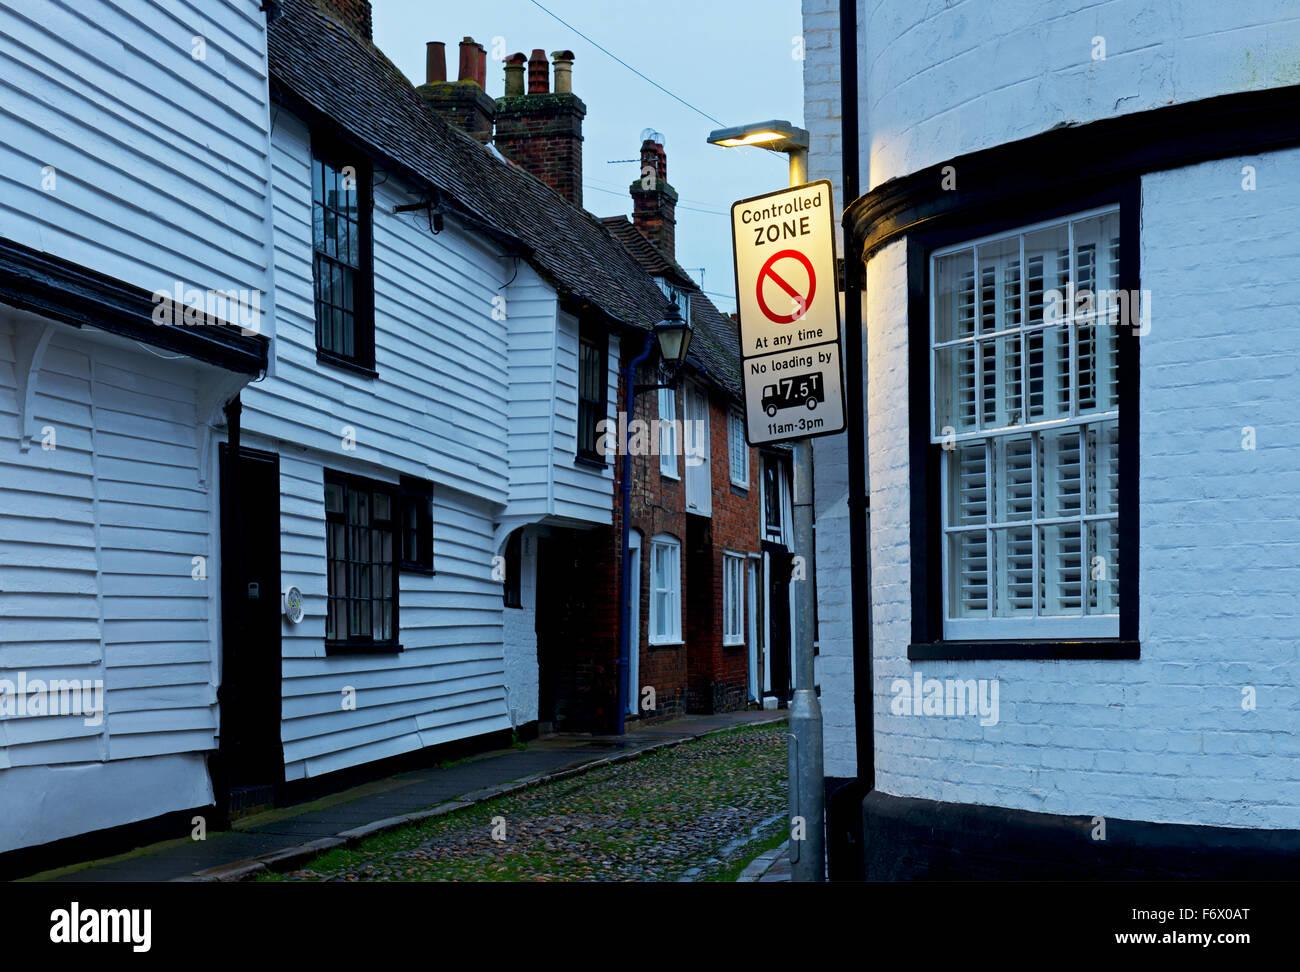 Controlled zone - no loading - in Rye, Kent, England UK - Stock Image